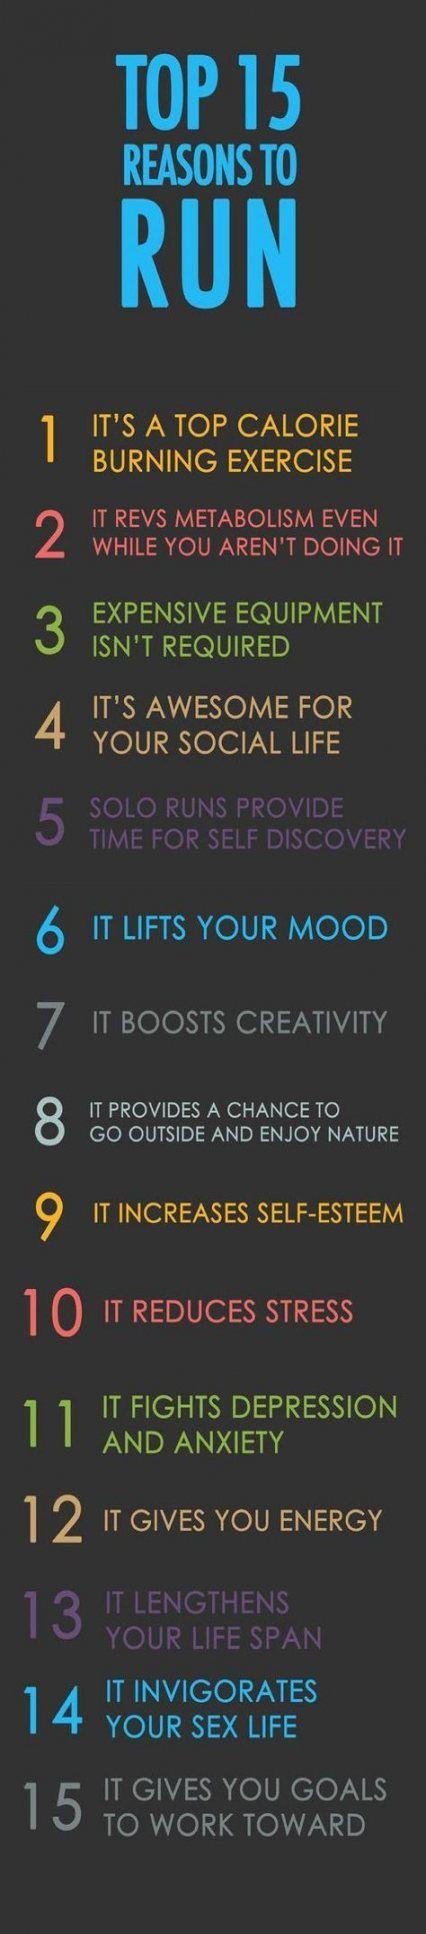 30+ Ideas Fitness Motivation Body Training #motivation #fitness